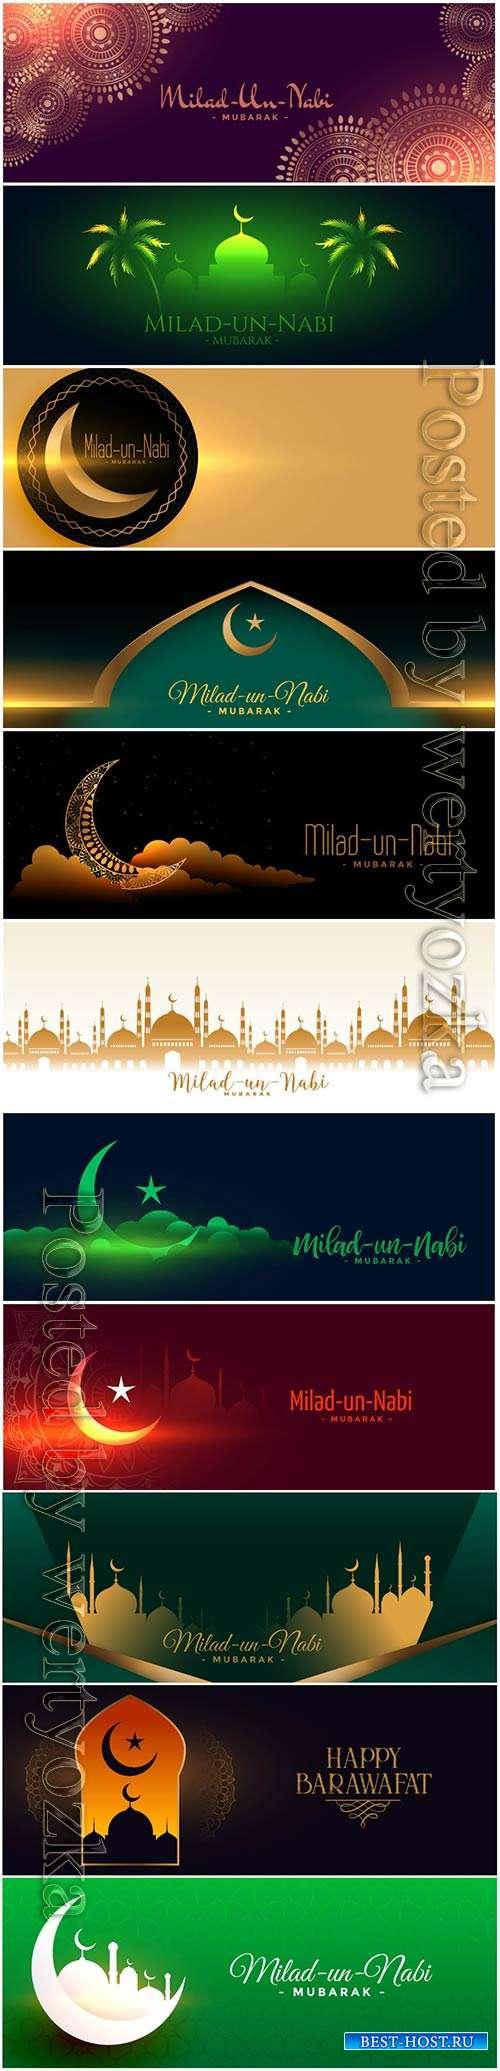 Milad un nabi banner with golden mosque design